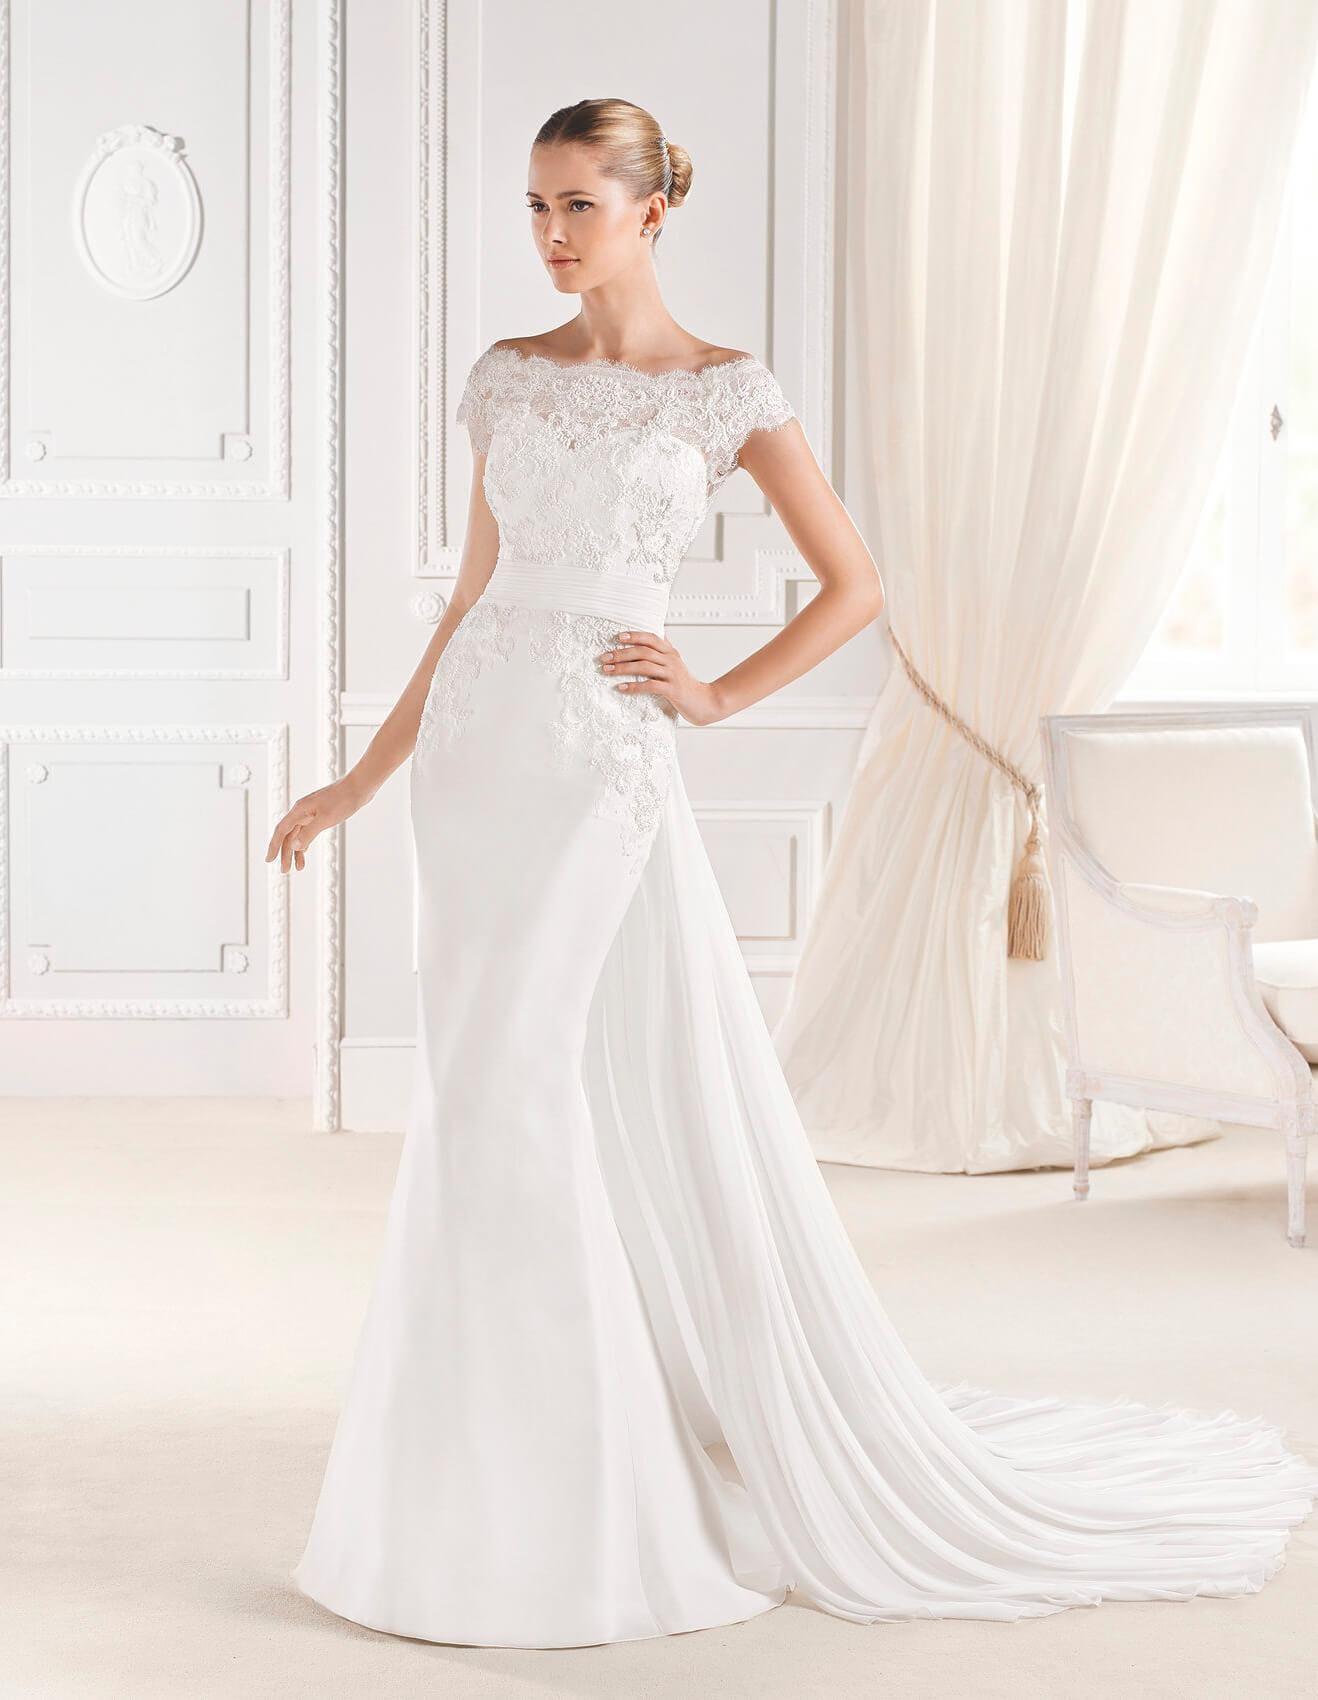 La Sposa beaded Elures wedding dress with detachable train